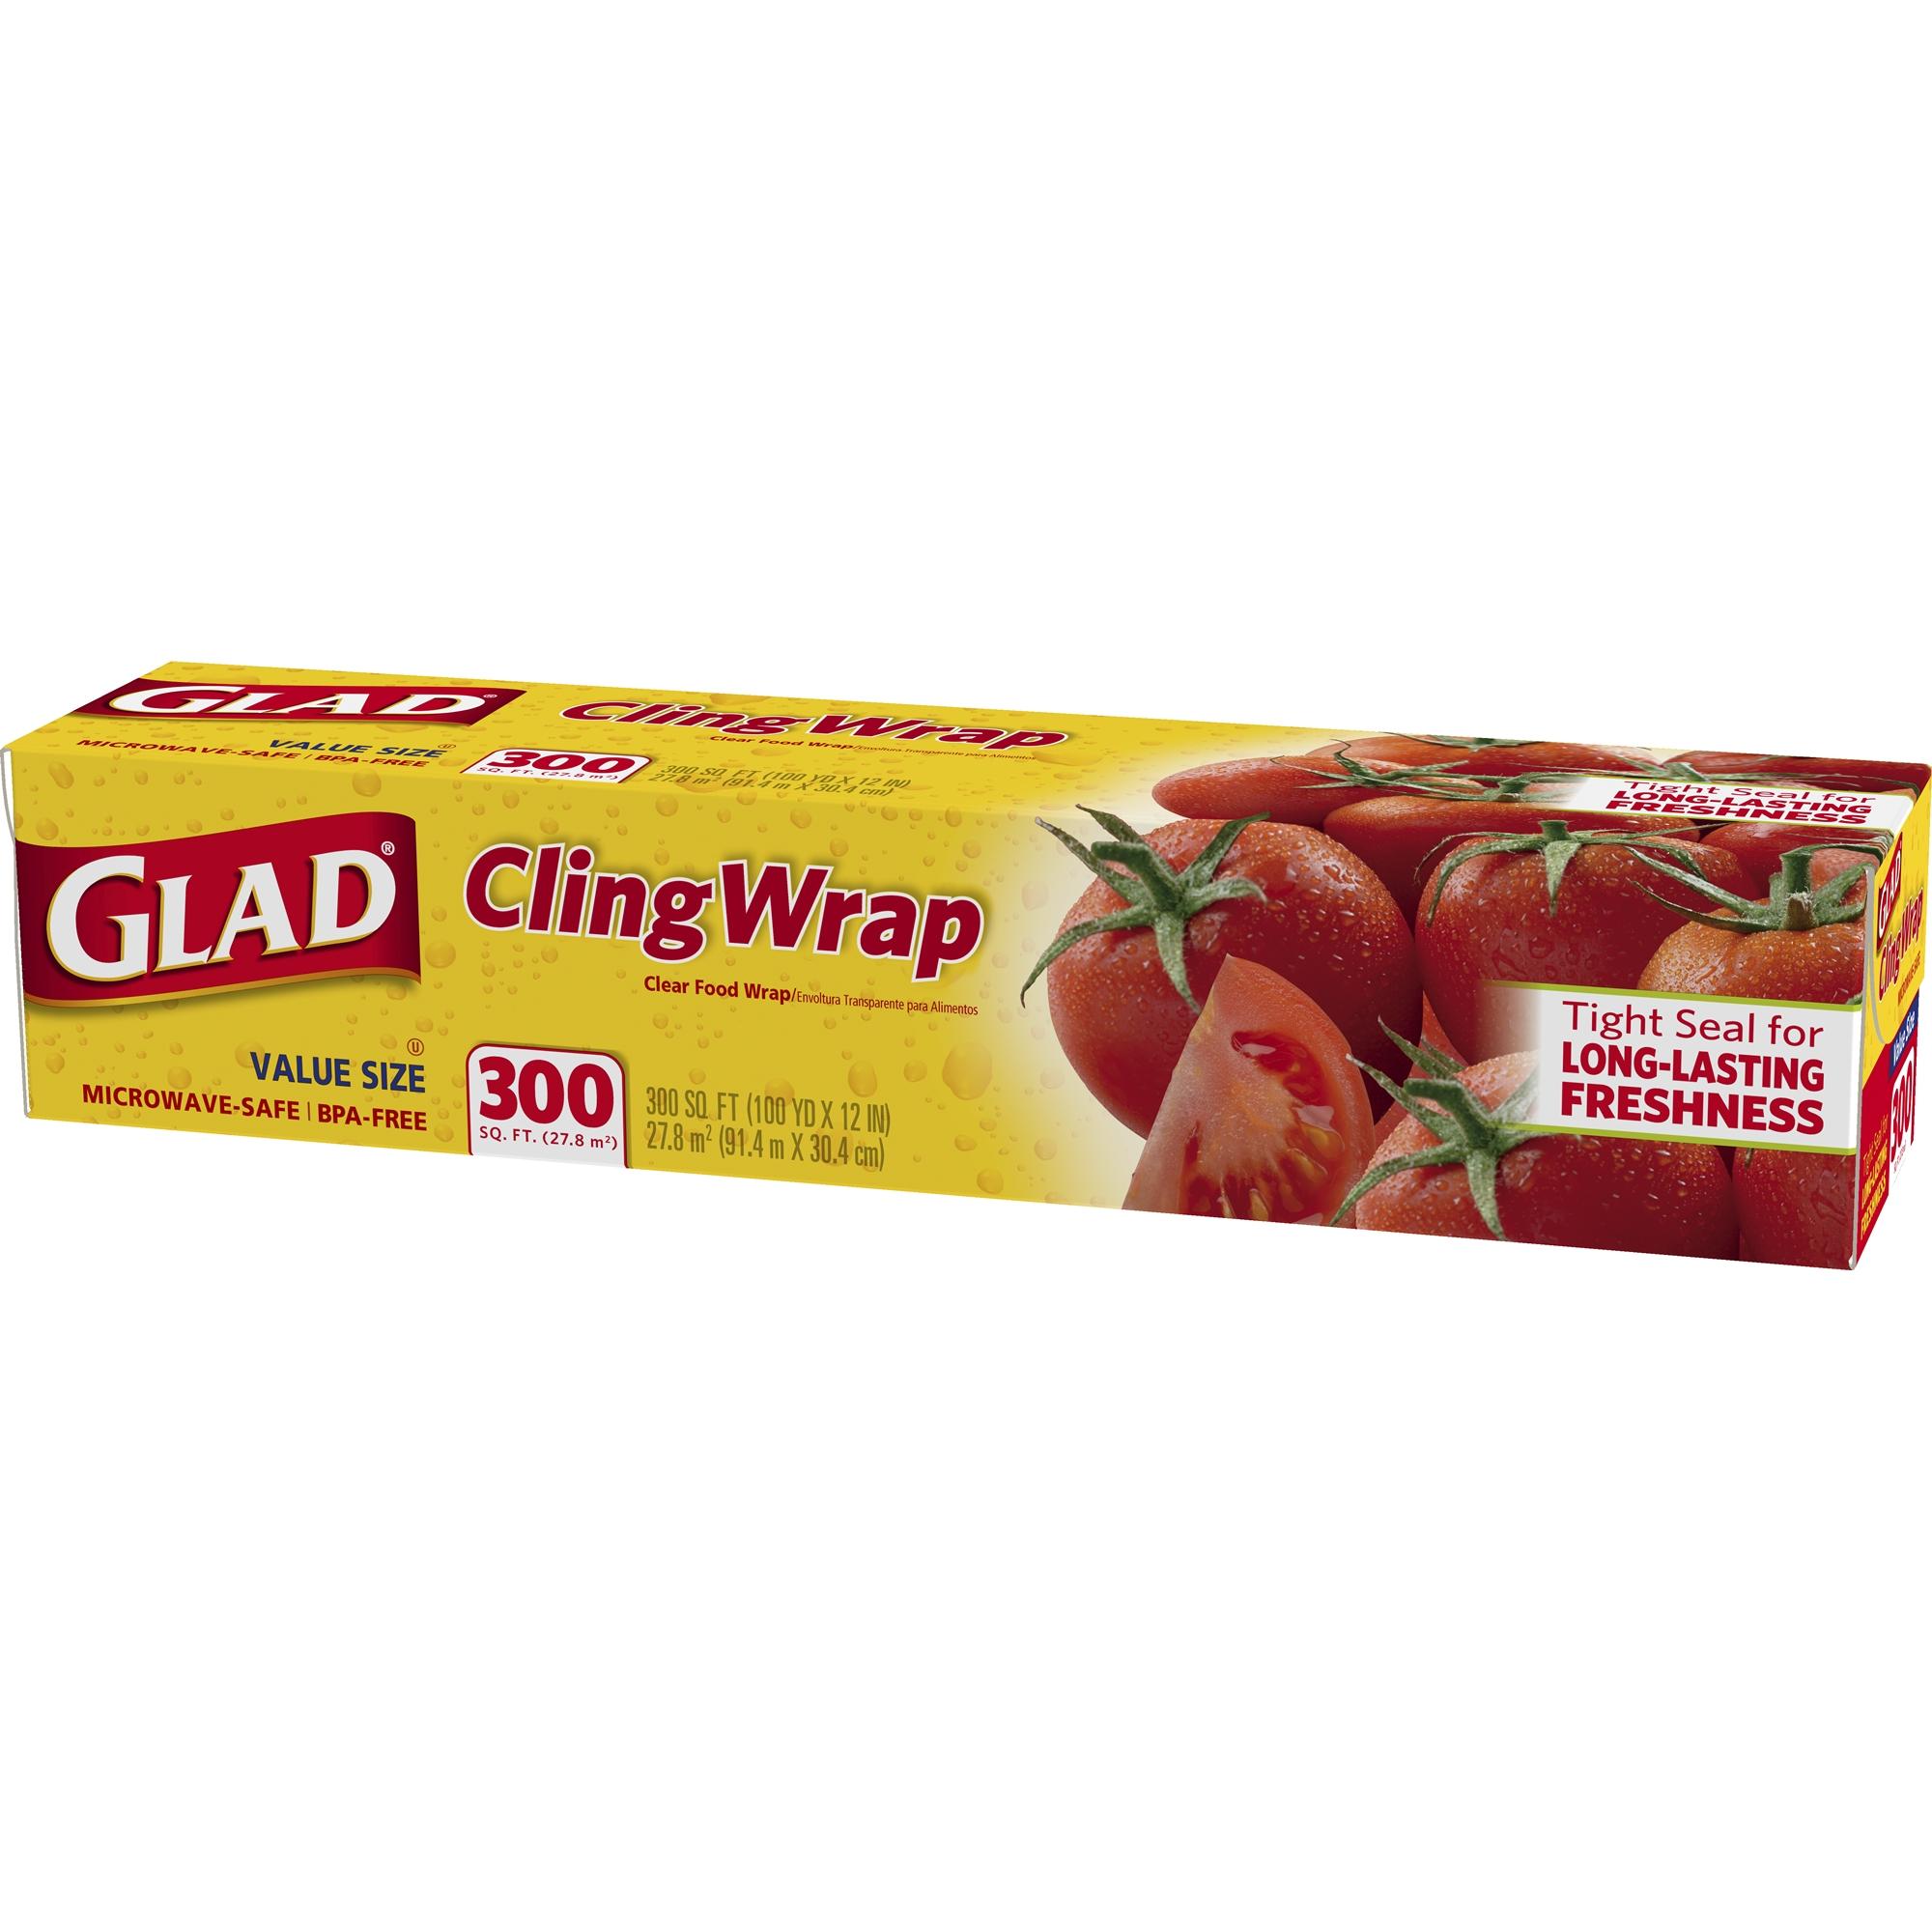 GLAD - CLING WRAP - 300sqft